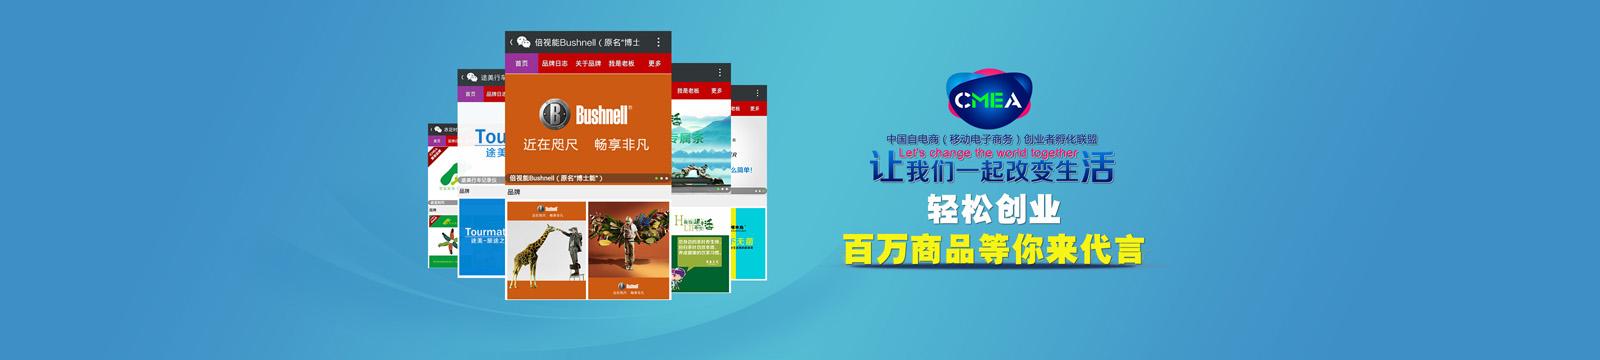 CMEA网页banner-服务商会员